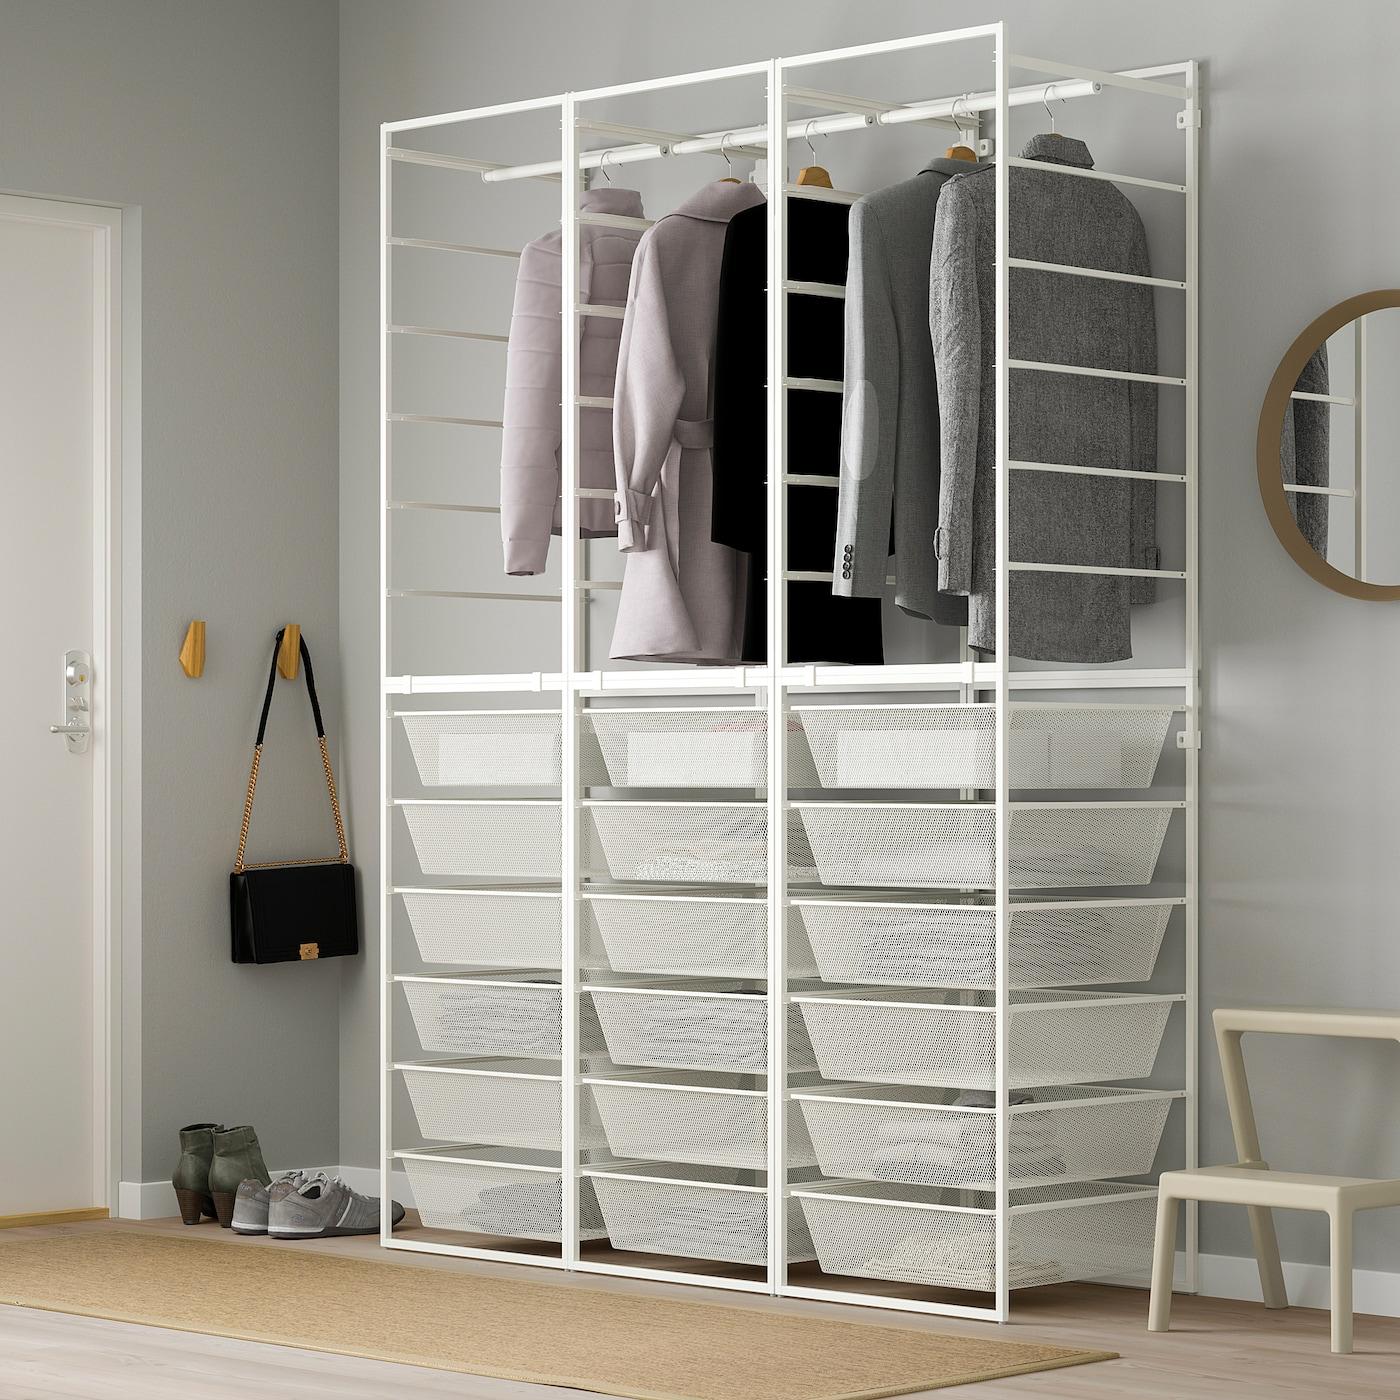 JONAXEL Wardrobe combination, white, 148x51x207 cm